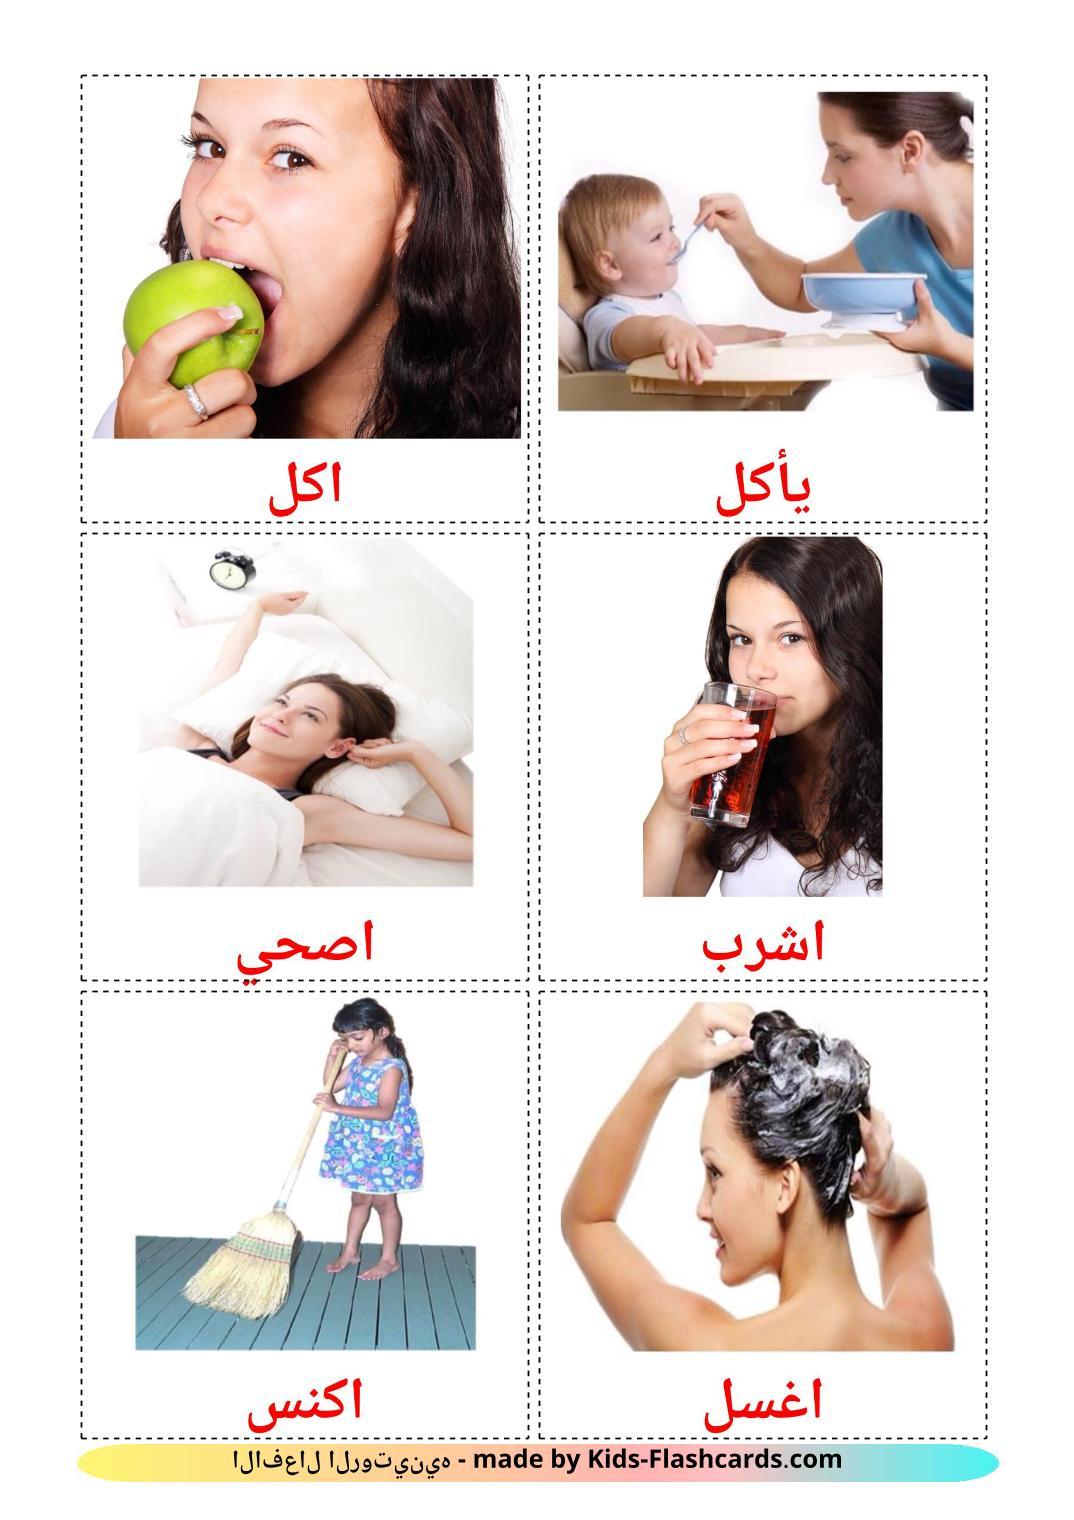 Routine verbs - 33 Free Printable arabic Flashcards